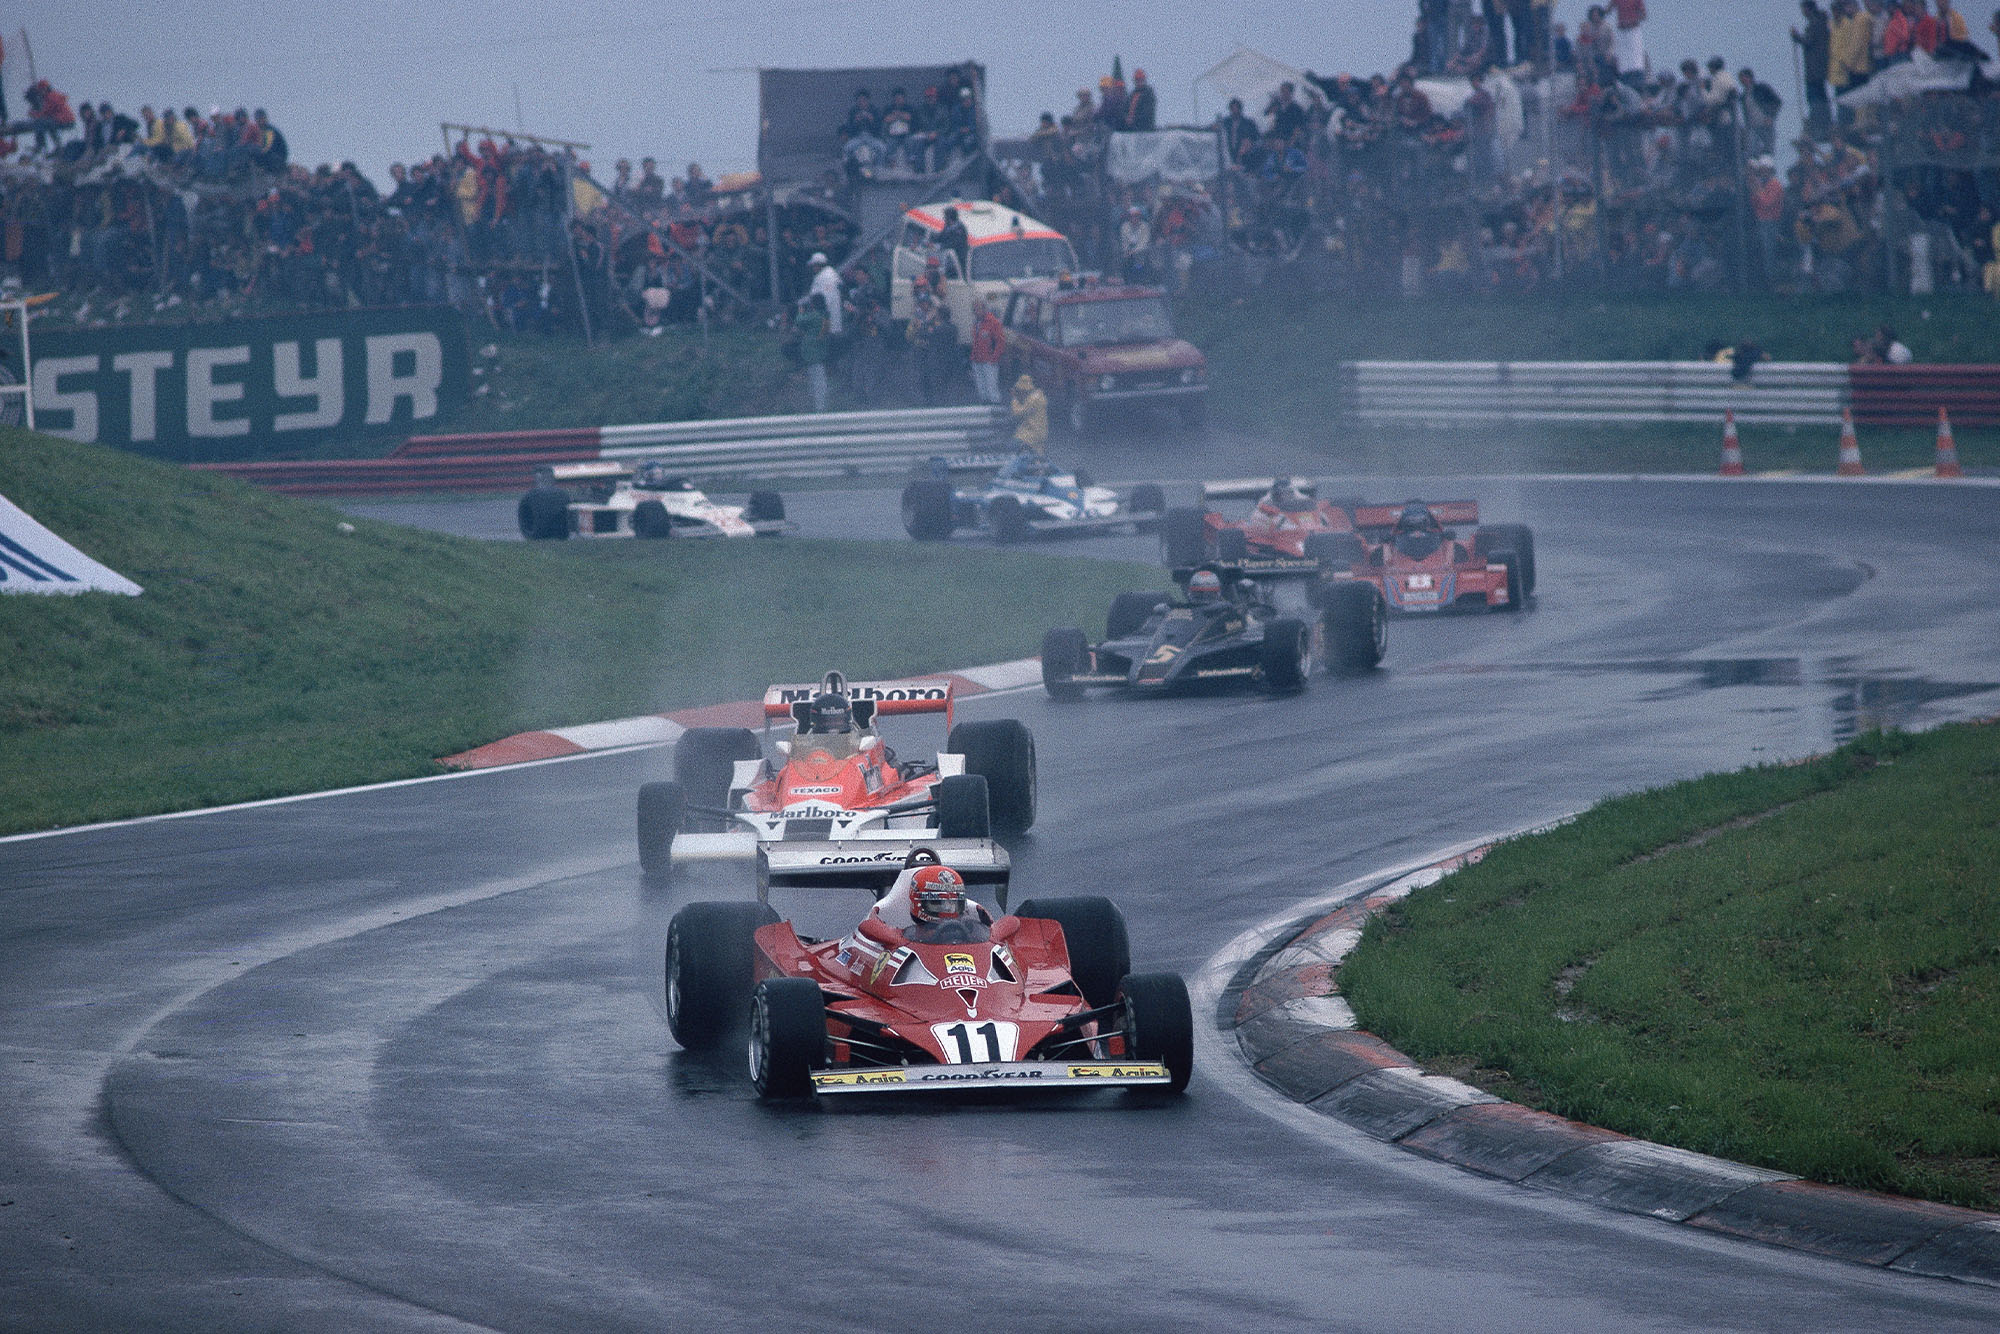 Niki Lauda (Ferrari) leads at the start of the 1977 Austrian Grand Prix, Österreichring.